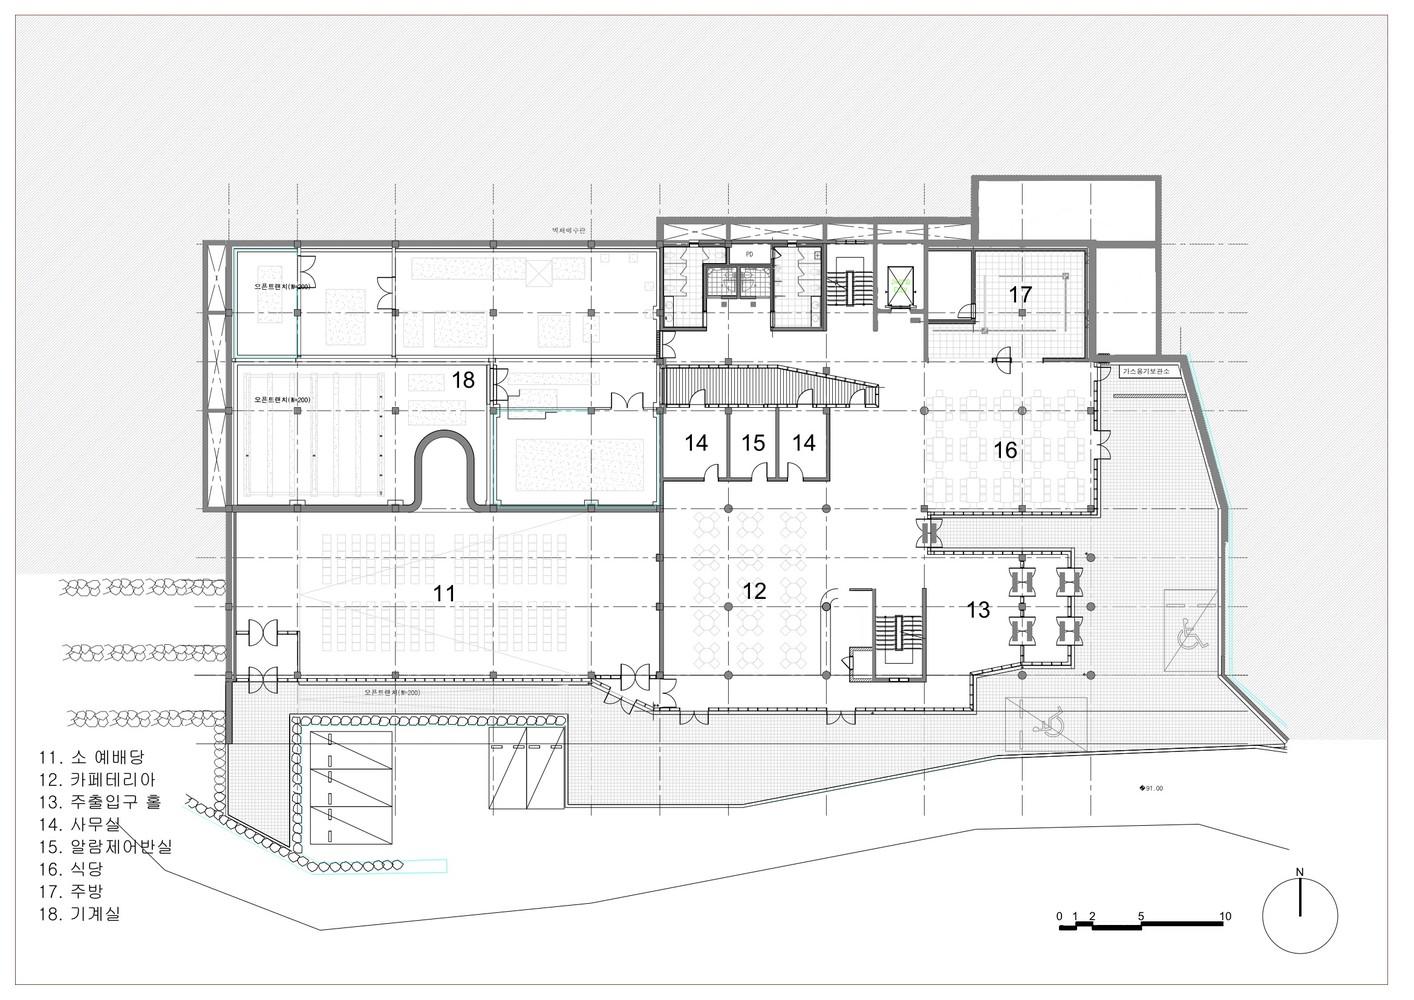 Lovely Church Of Light Floor Plan Part - 2: Light Of Life Church,Floor Plan